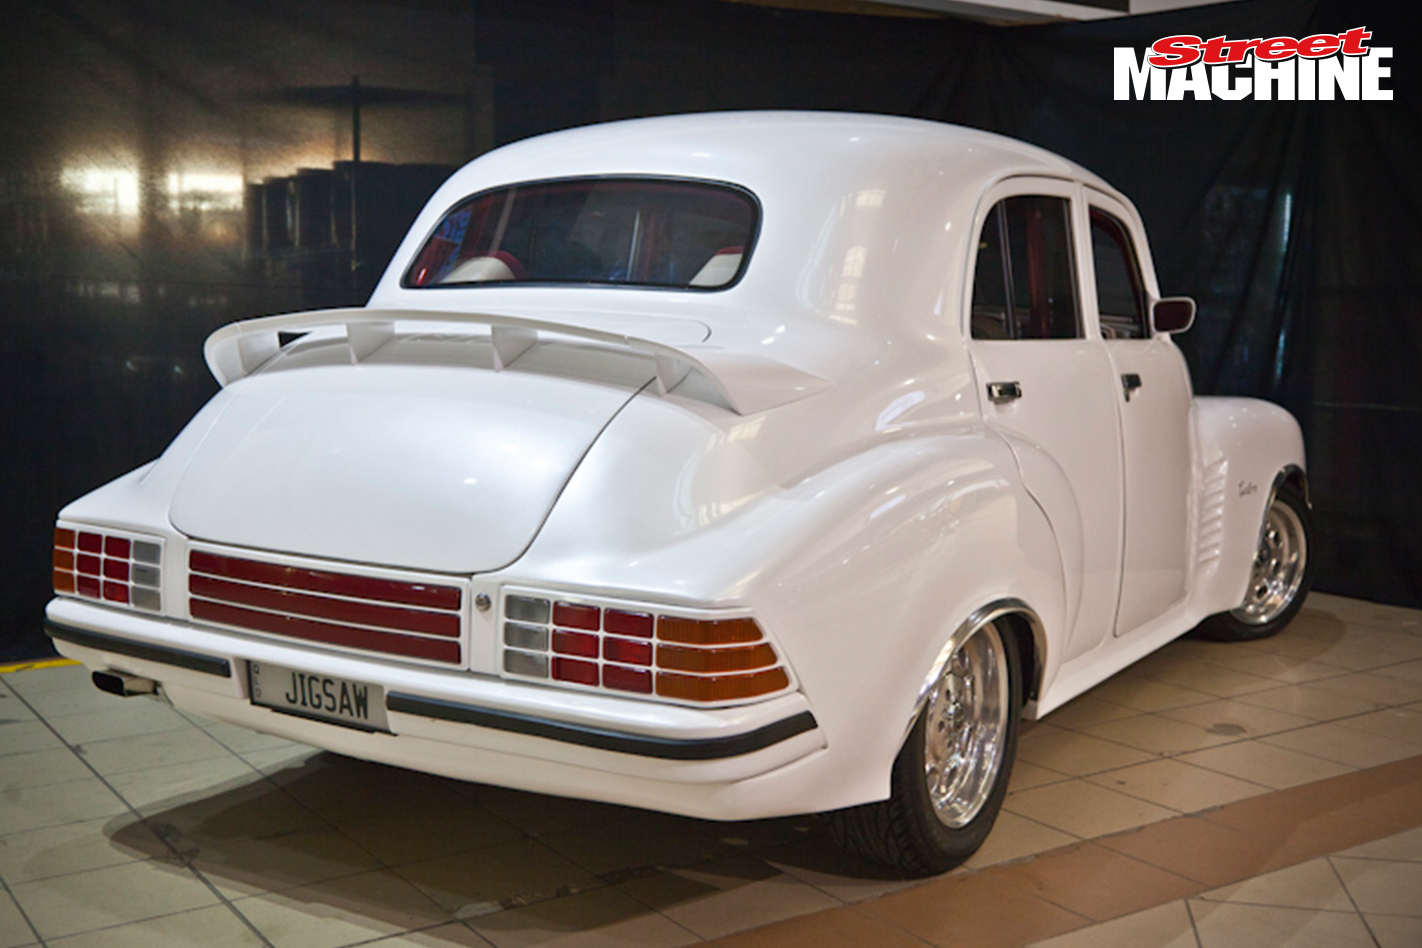 FJ Holden JIGSAW 7